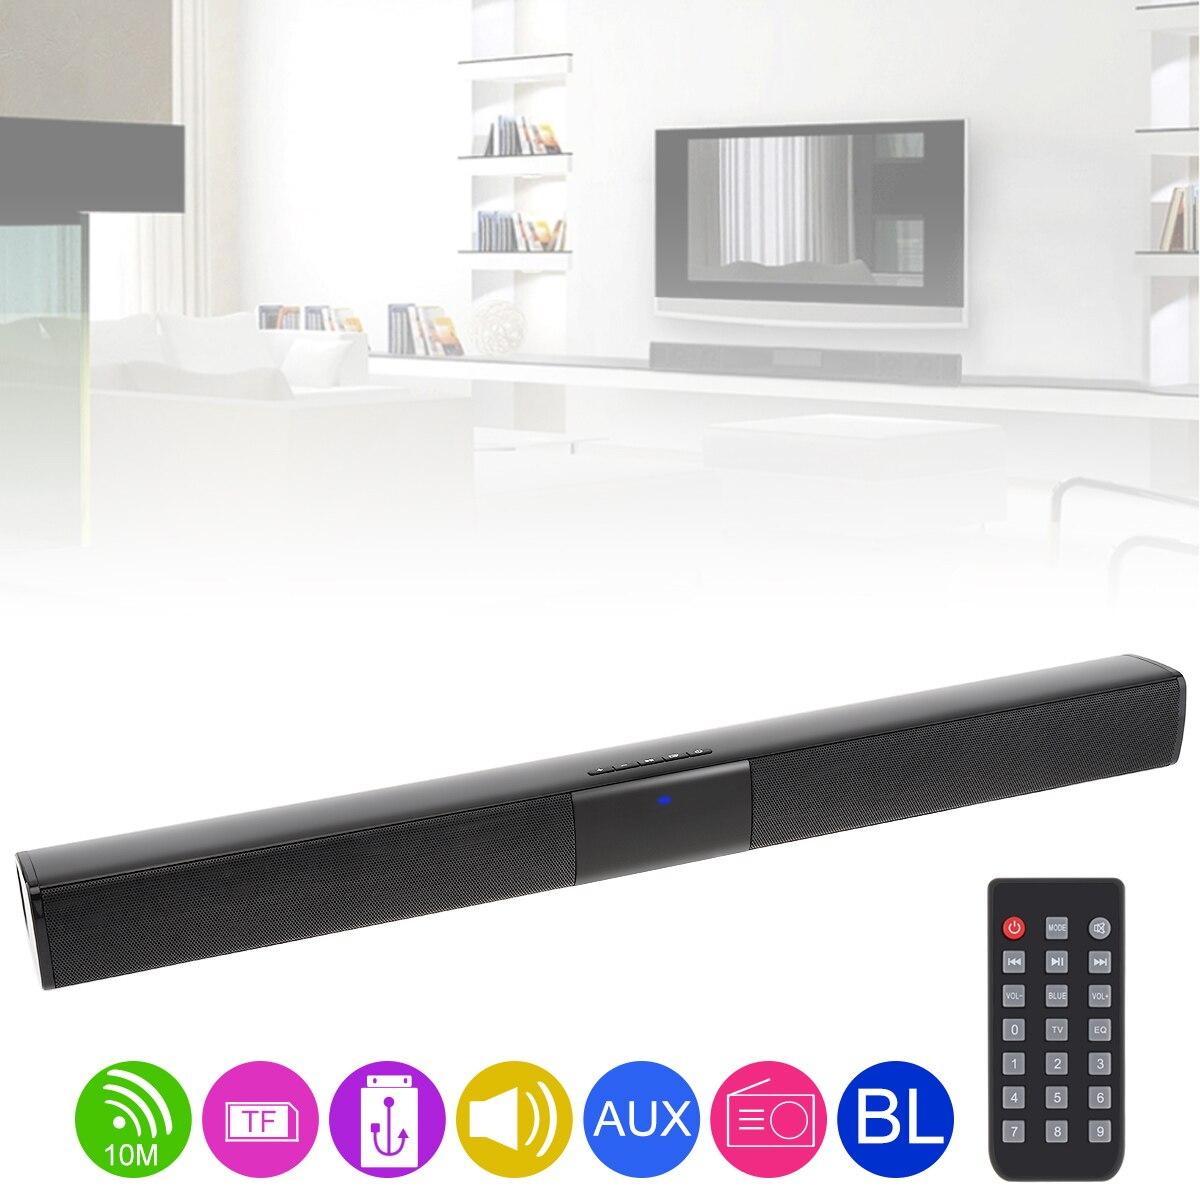 BS-28B Home Theater Surround Multi-función Bluetooth Soundbar altavoz con 4 cuernos de rango completo/3,5mm AUX/RCA interfaz para TV